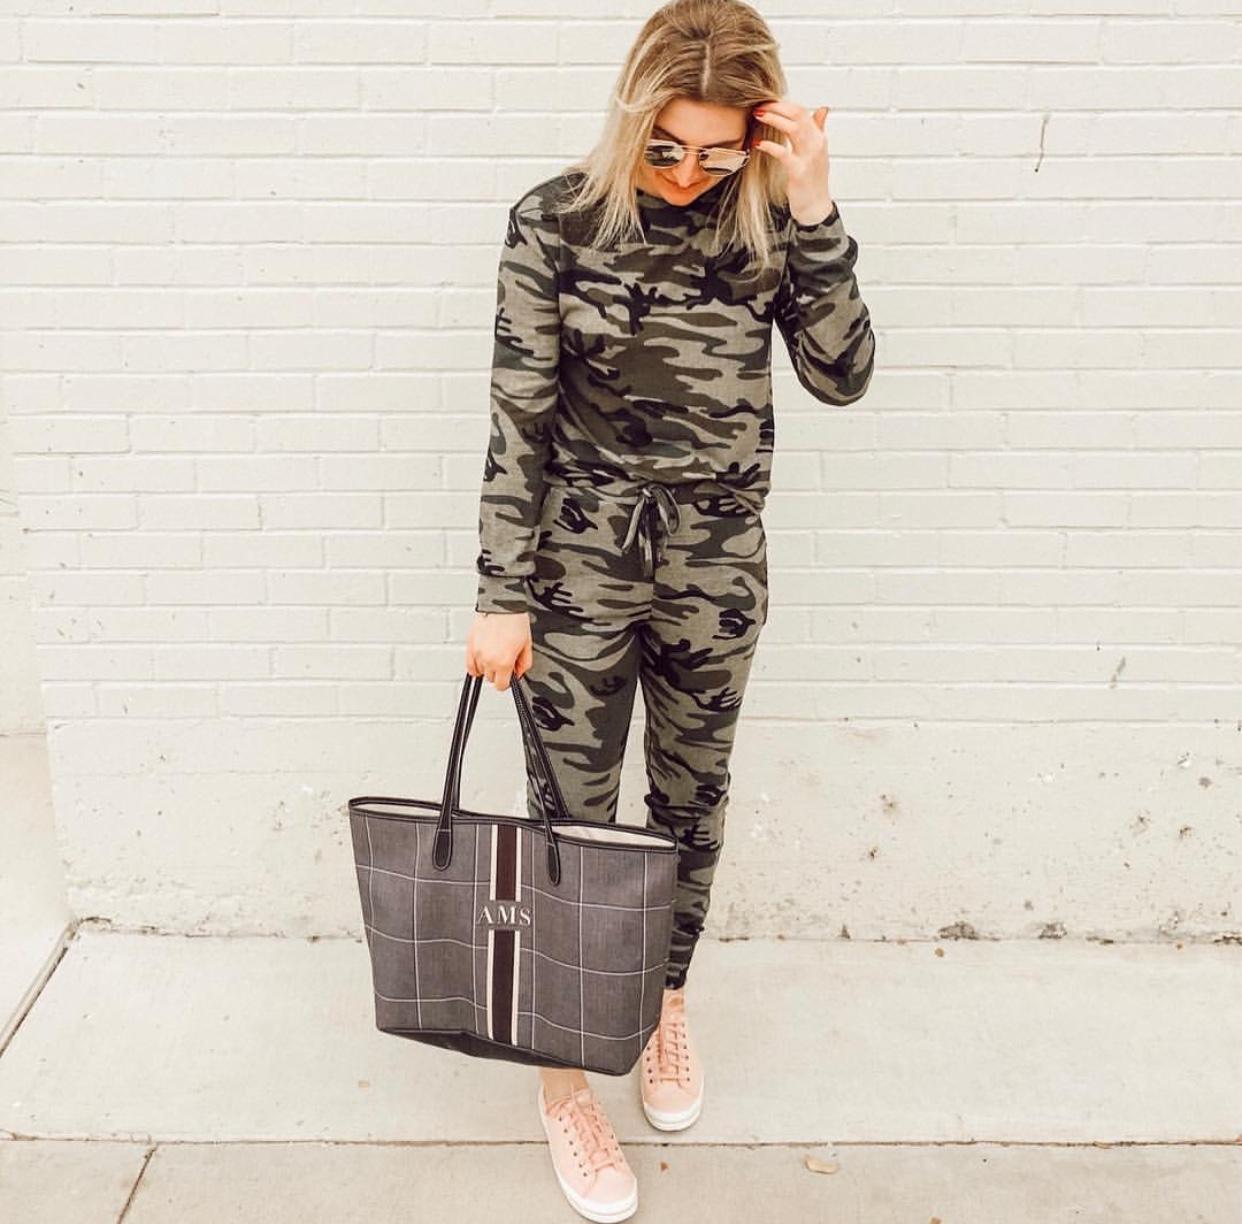 Camo lounge set | Audrey Madison Stowe a fashion and lifestyle blogger